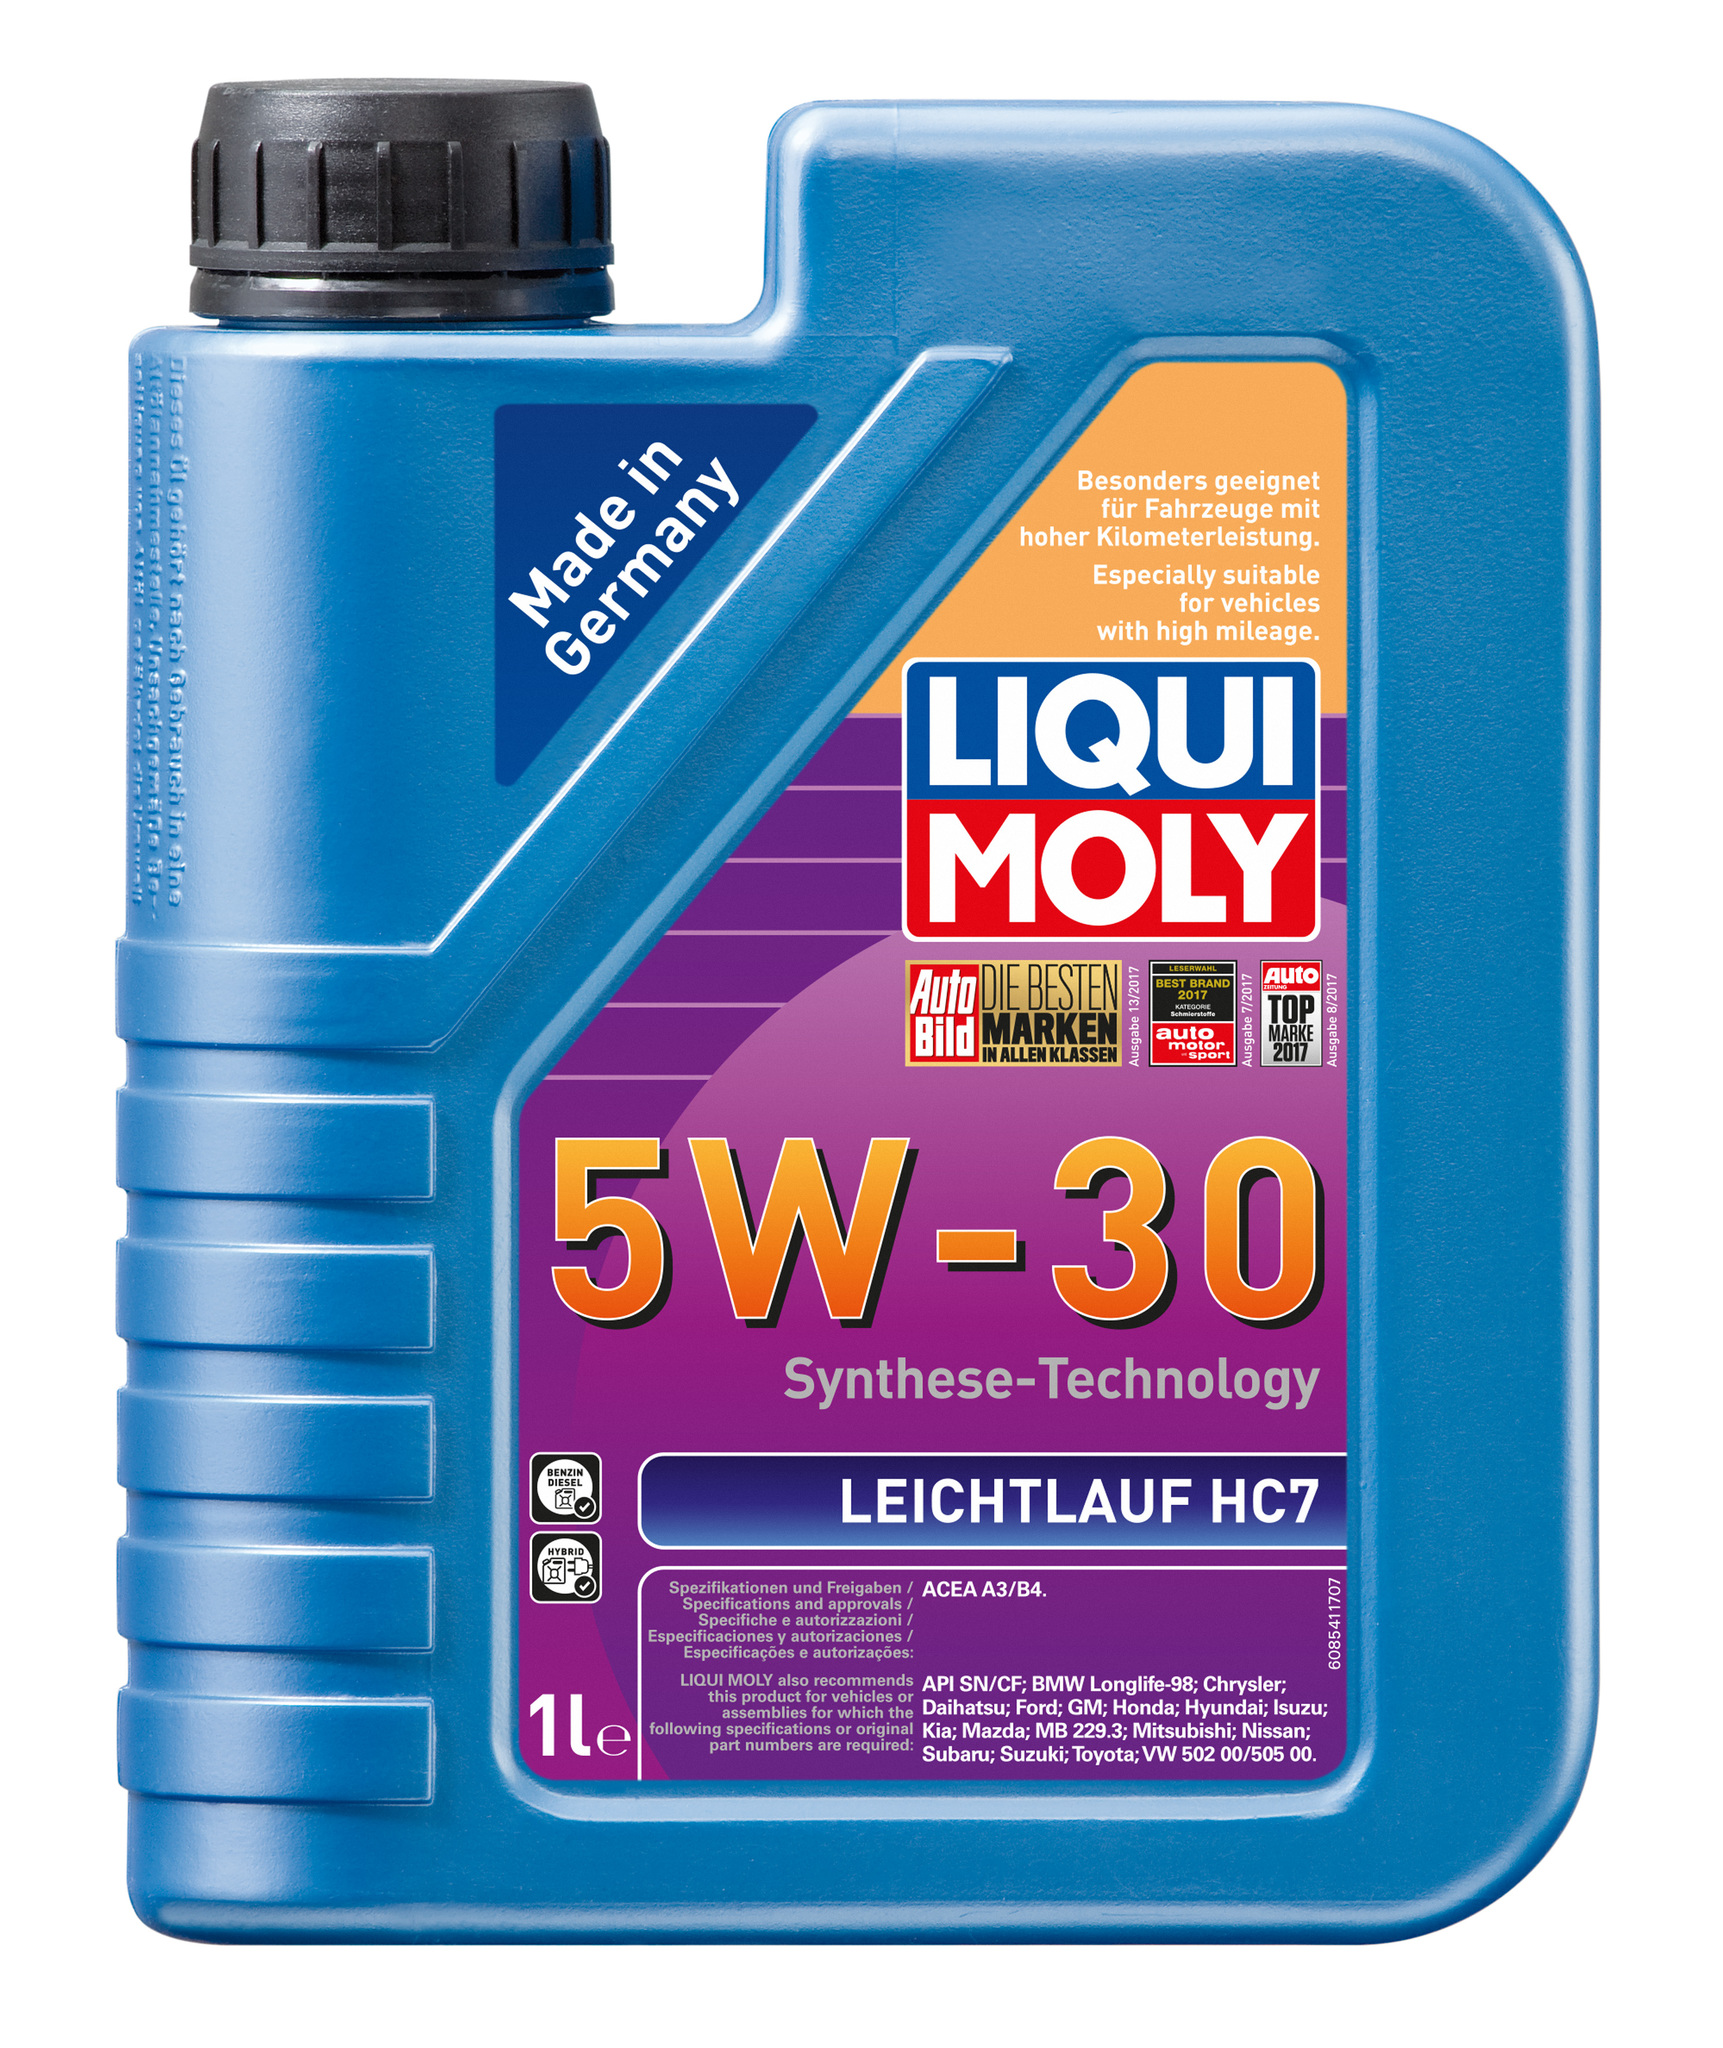 Liqui Moly Leichtlauf HC 7 5W30 НС-синтетическое моторное масло